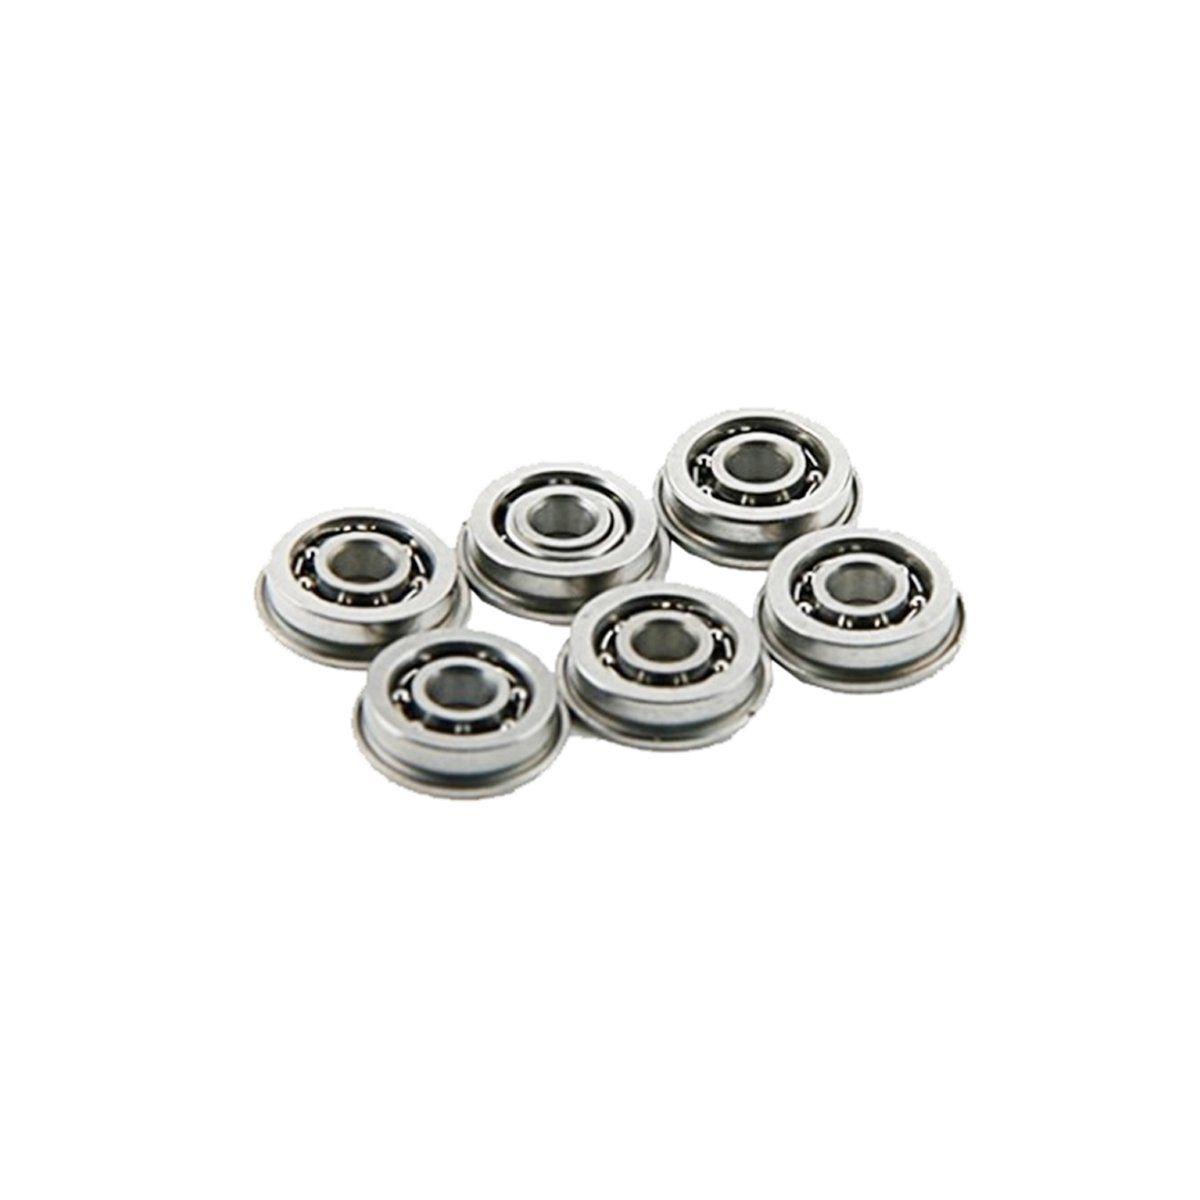 Conjunto de Rolamento 7mm Aço Inox 6 Unidades Taitus